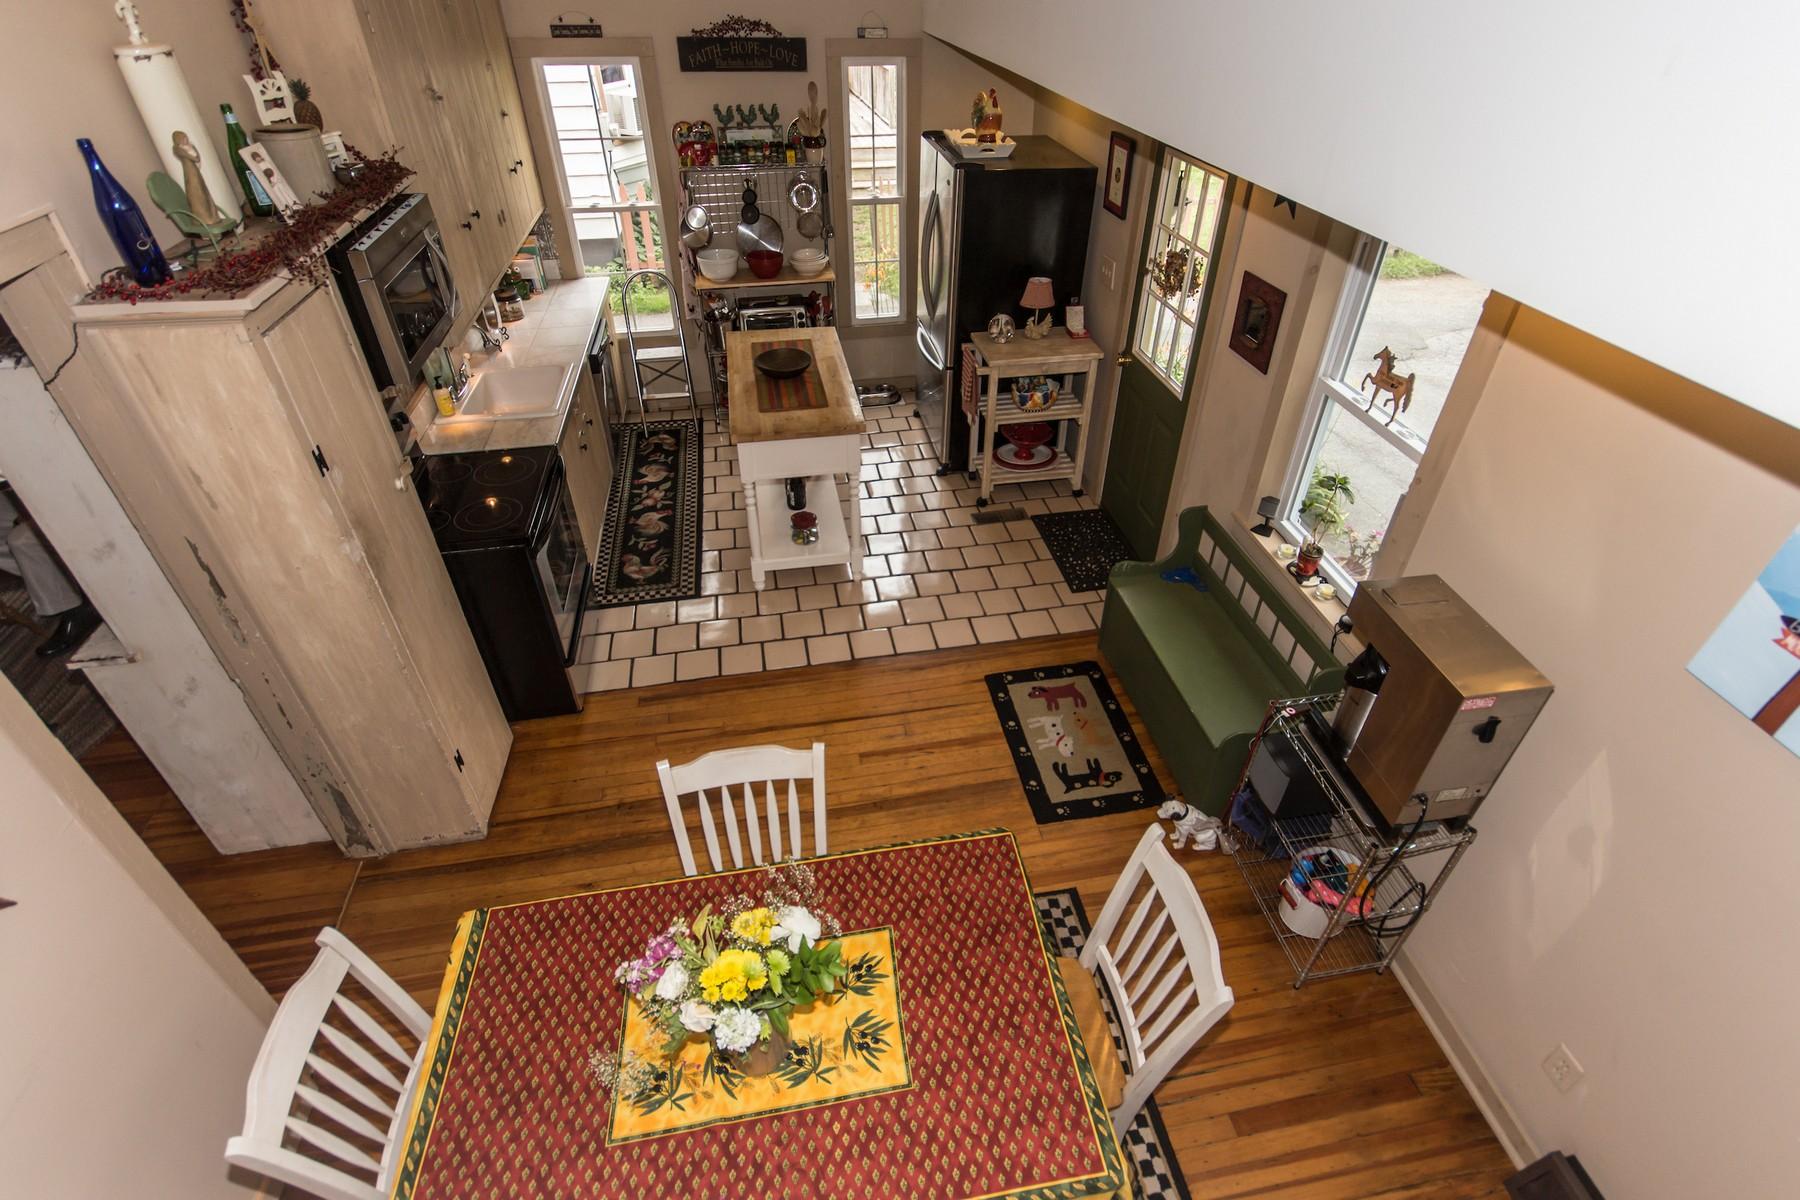 Additional photo for property listing at Quaint Home Full of Country Charm 4  Mowry Av 格林威治, 纽约州 12834 美国